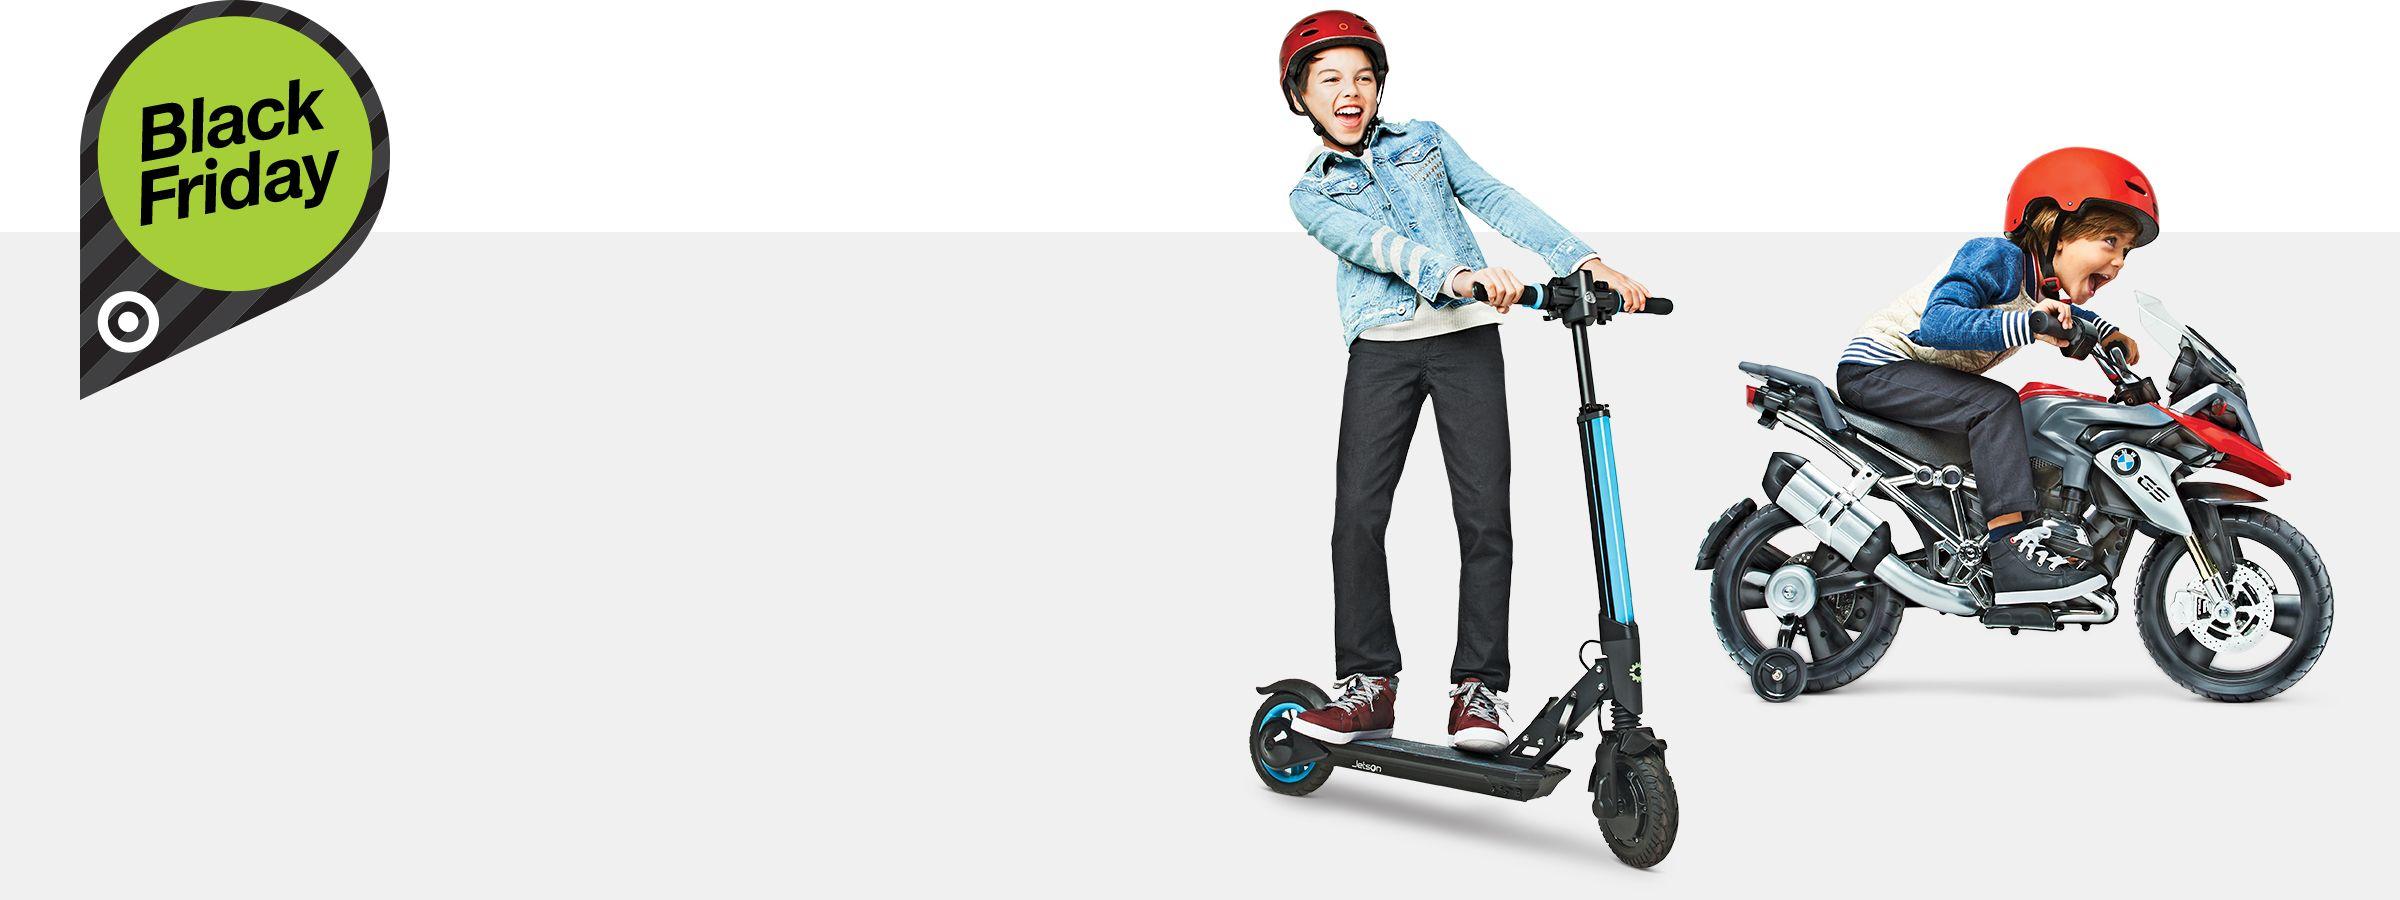 Disney princess scooters skateboards skates target for Motorized scooter black friday